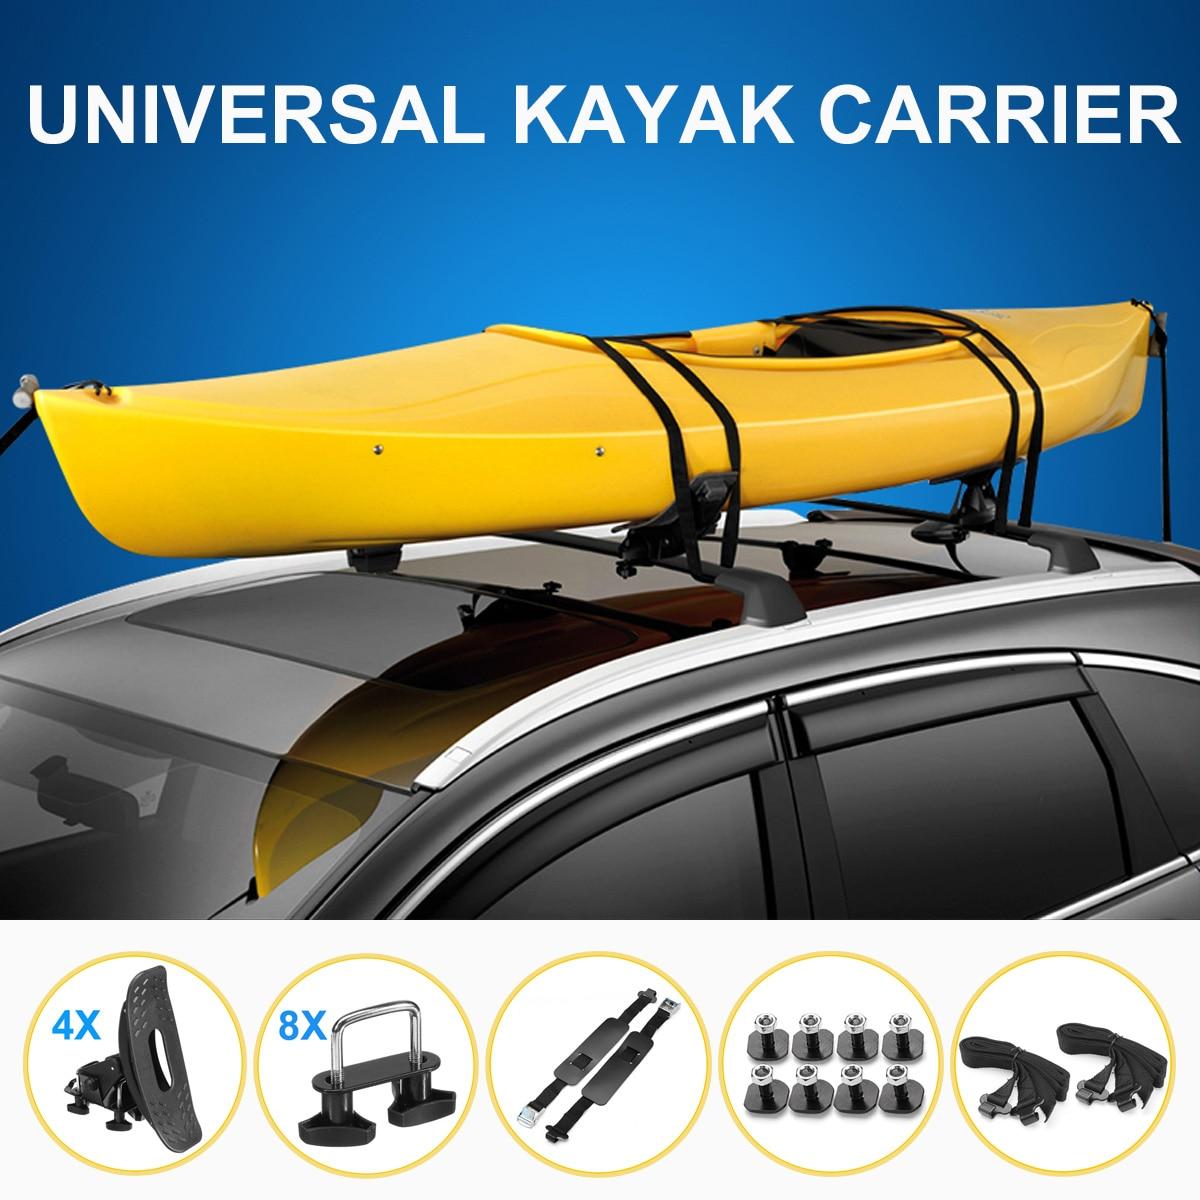 Universal Kayak Rack Titulaire Porte-Kayak Selle Motomarines Toit Rack Bras Canoë Bateau De Voiture toit Rack Kayak Accessoires